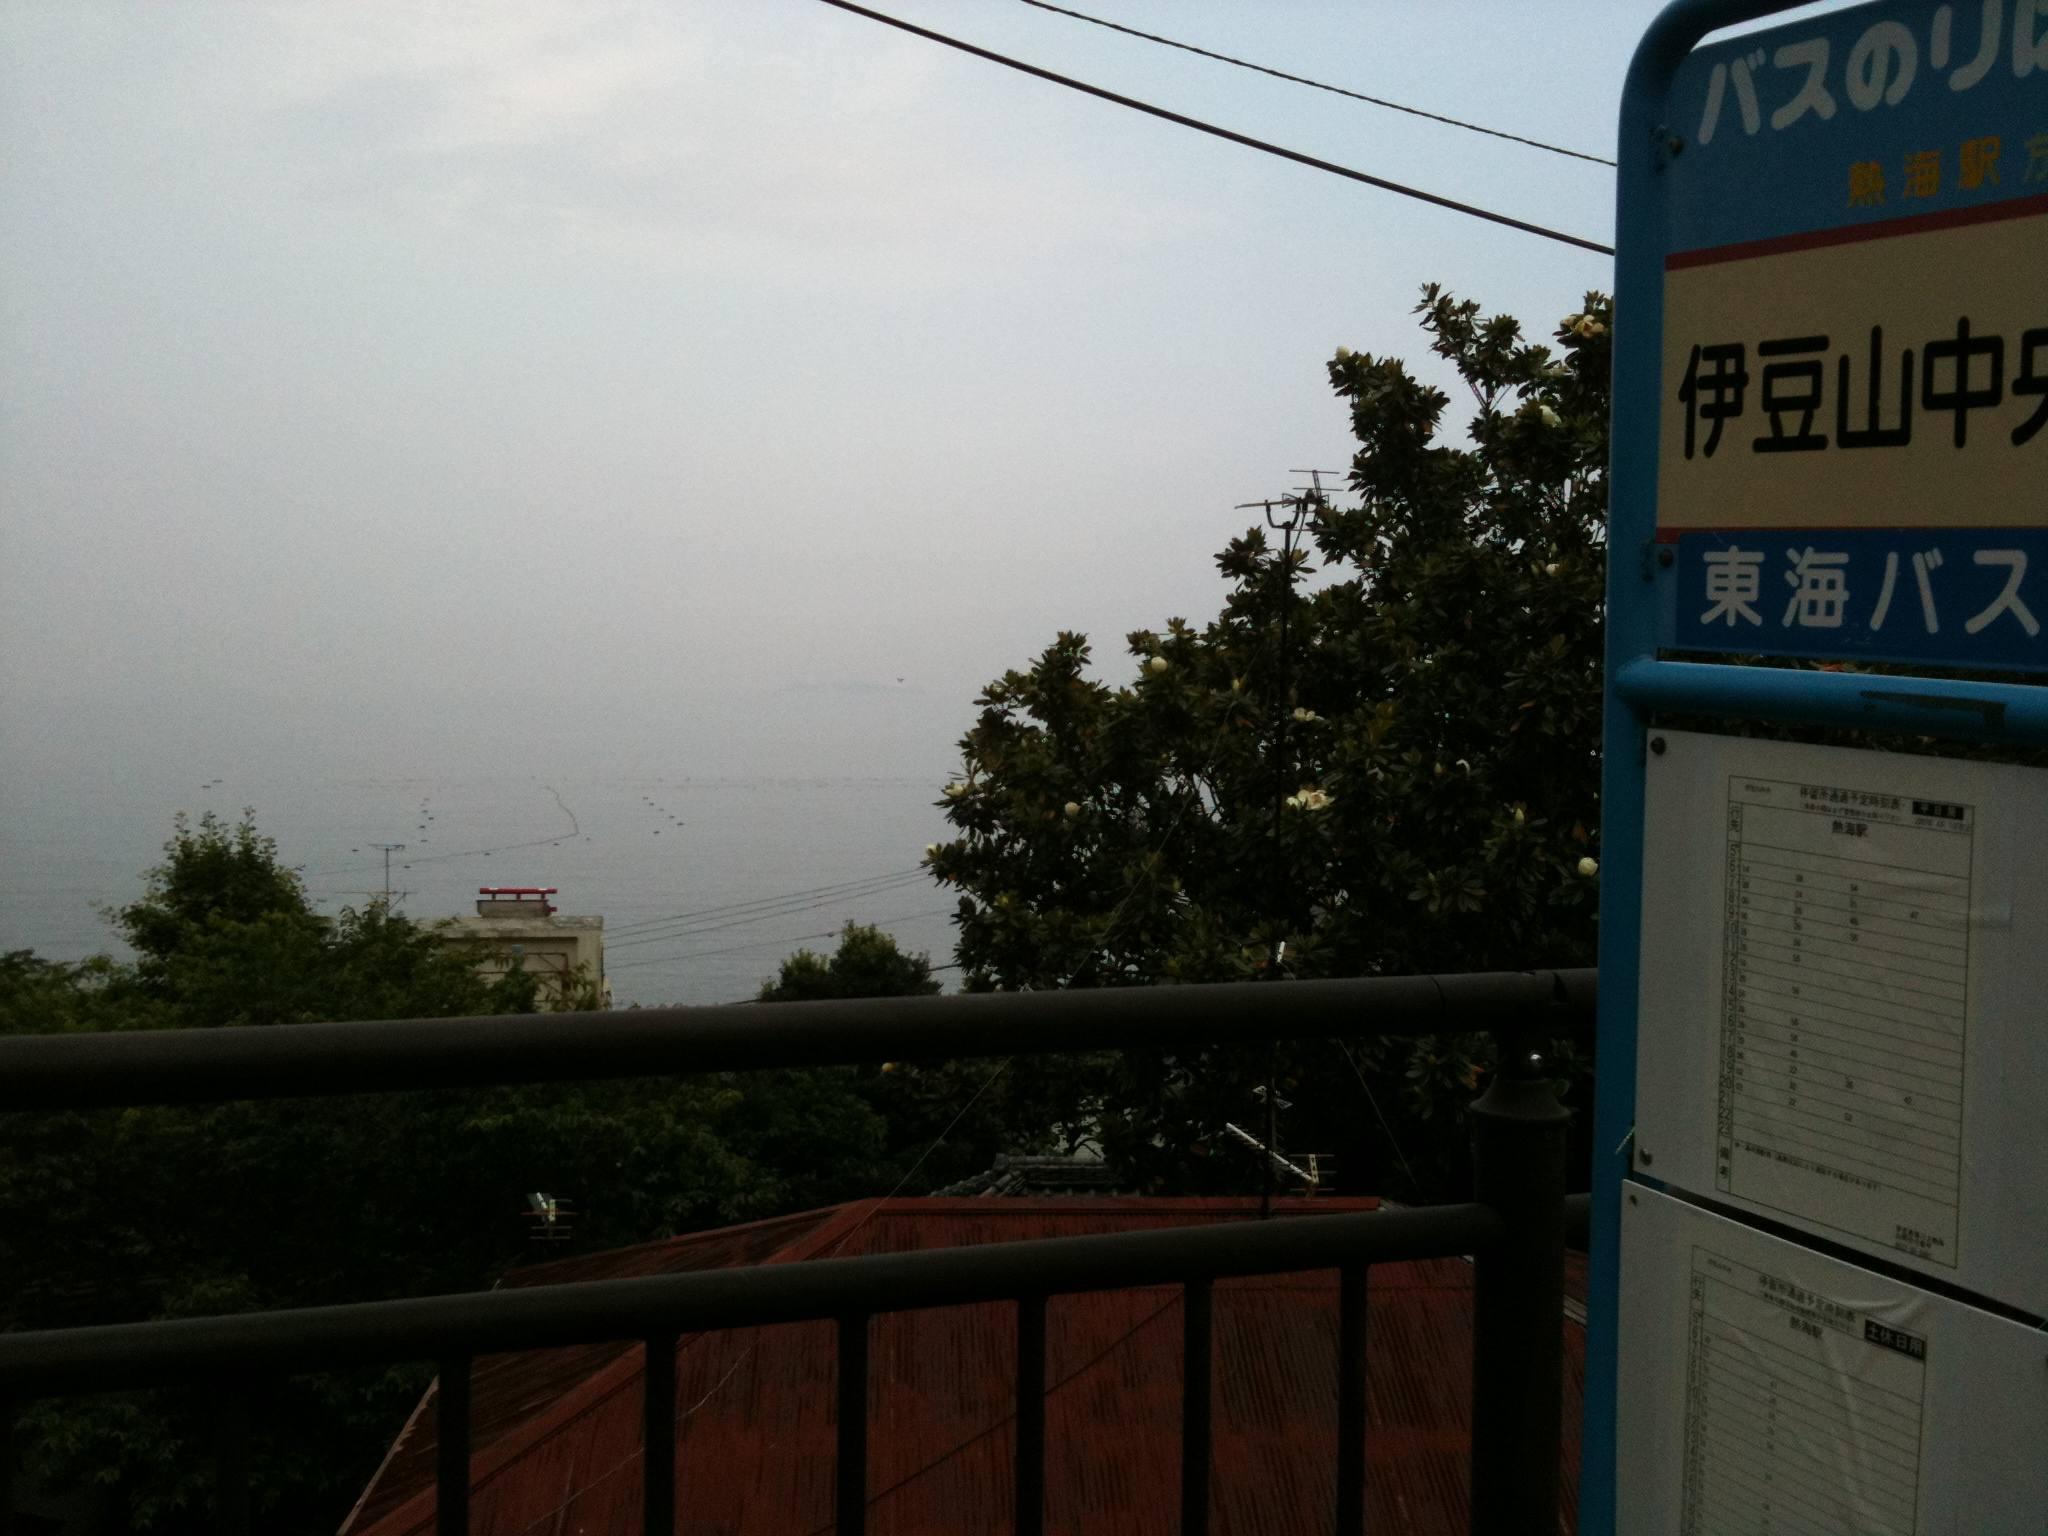 伊豆山バス停